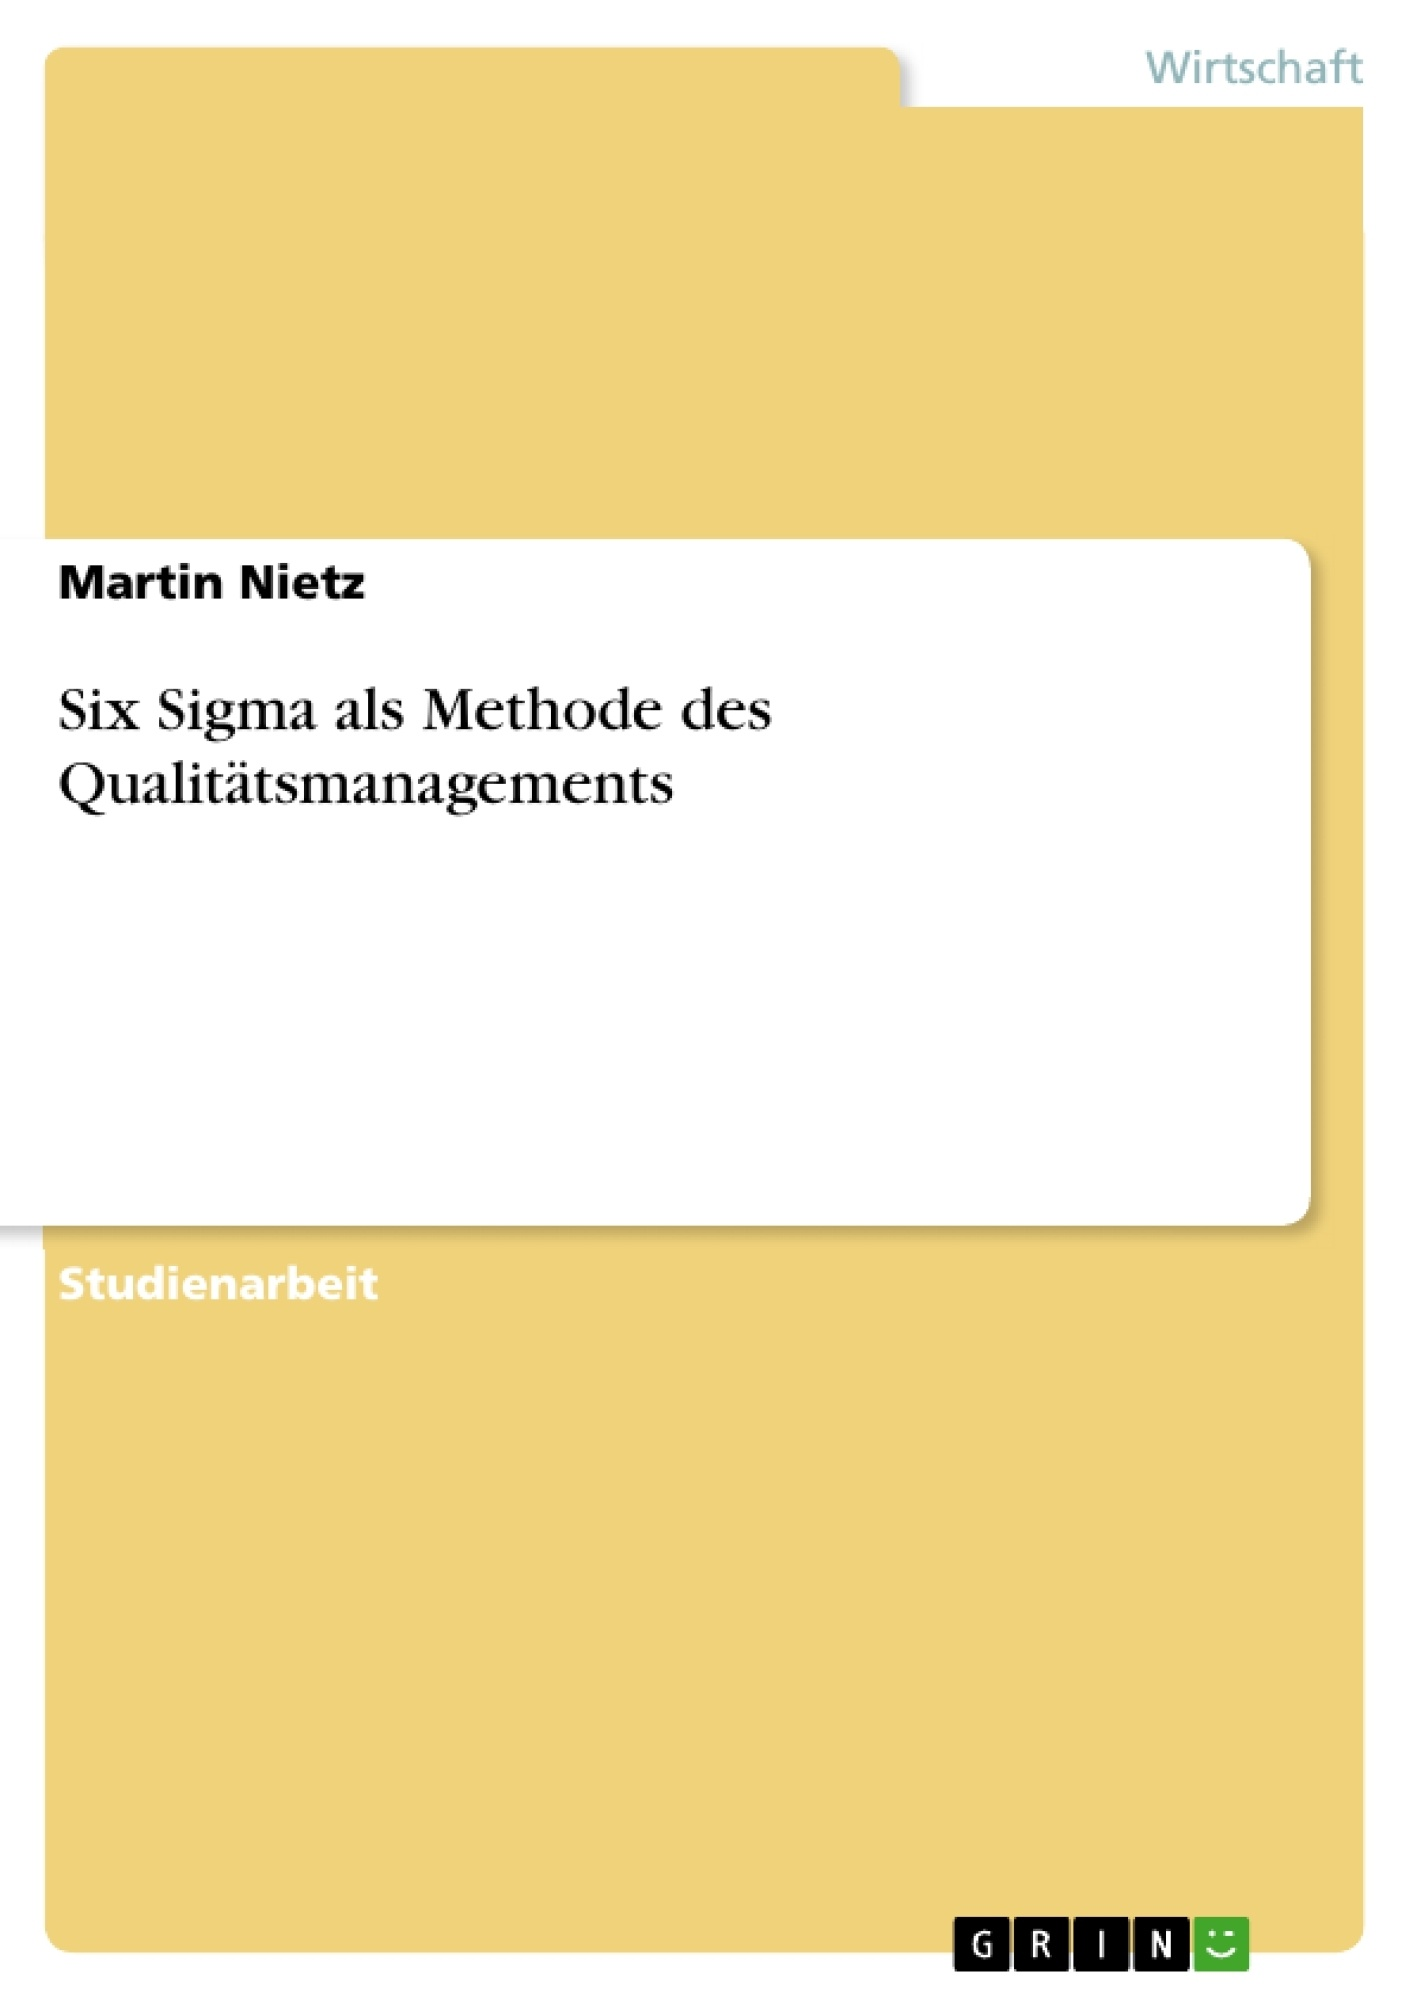 Titel: Six Sigma als Methode des Qualitätsmanagements